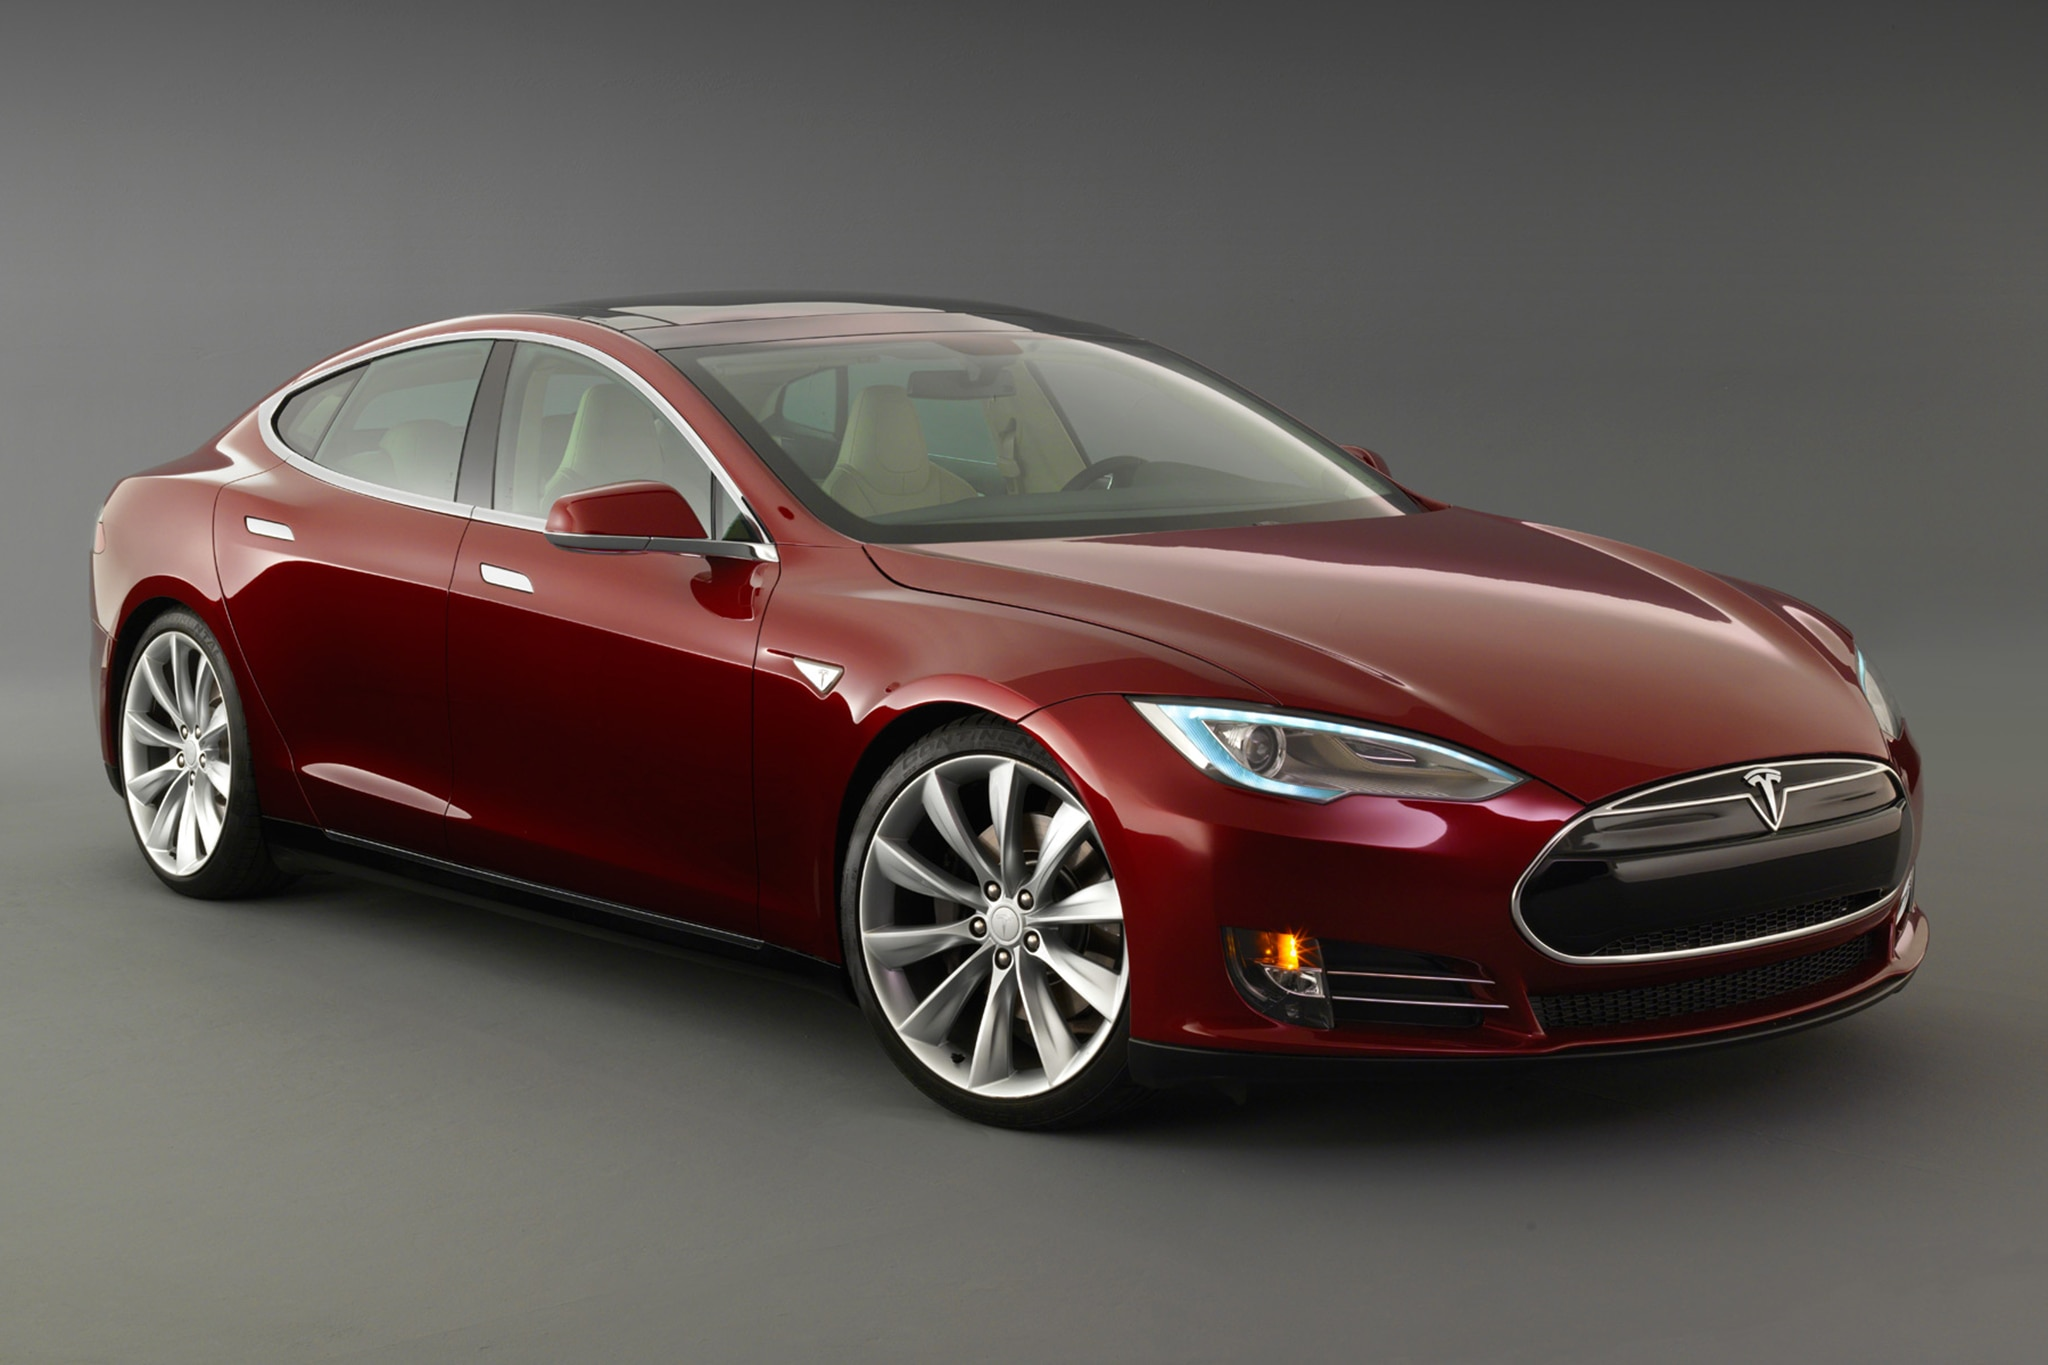 2014 Tesla Model S Three Quarters View1